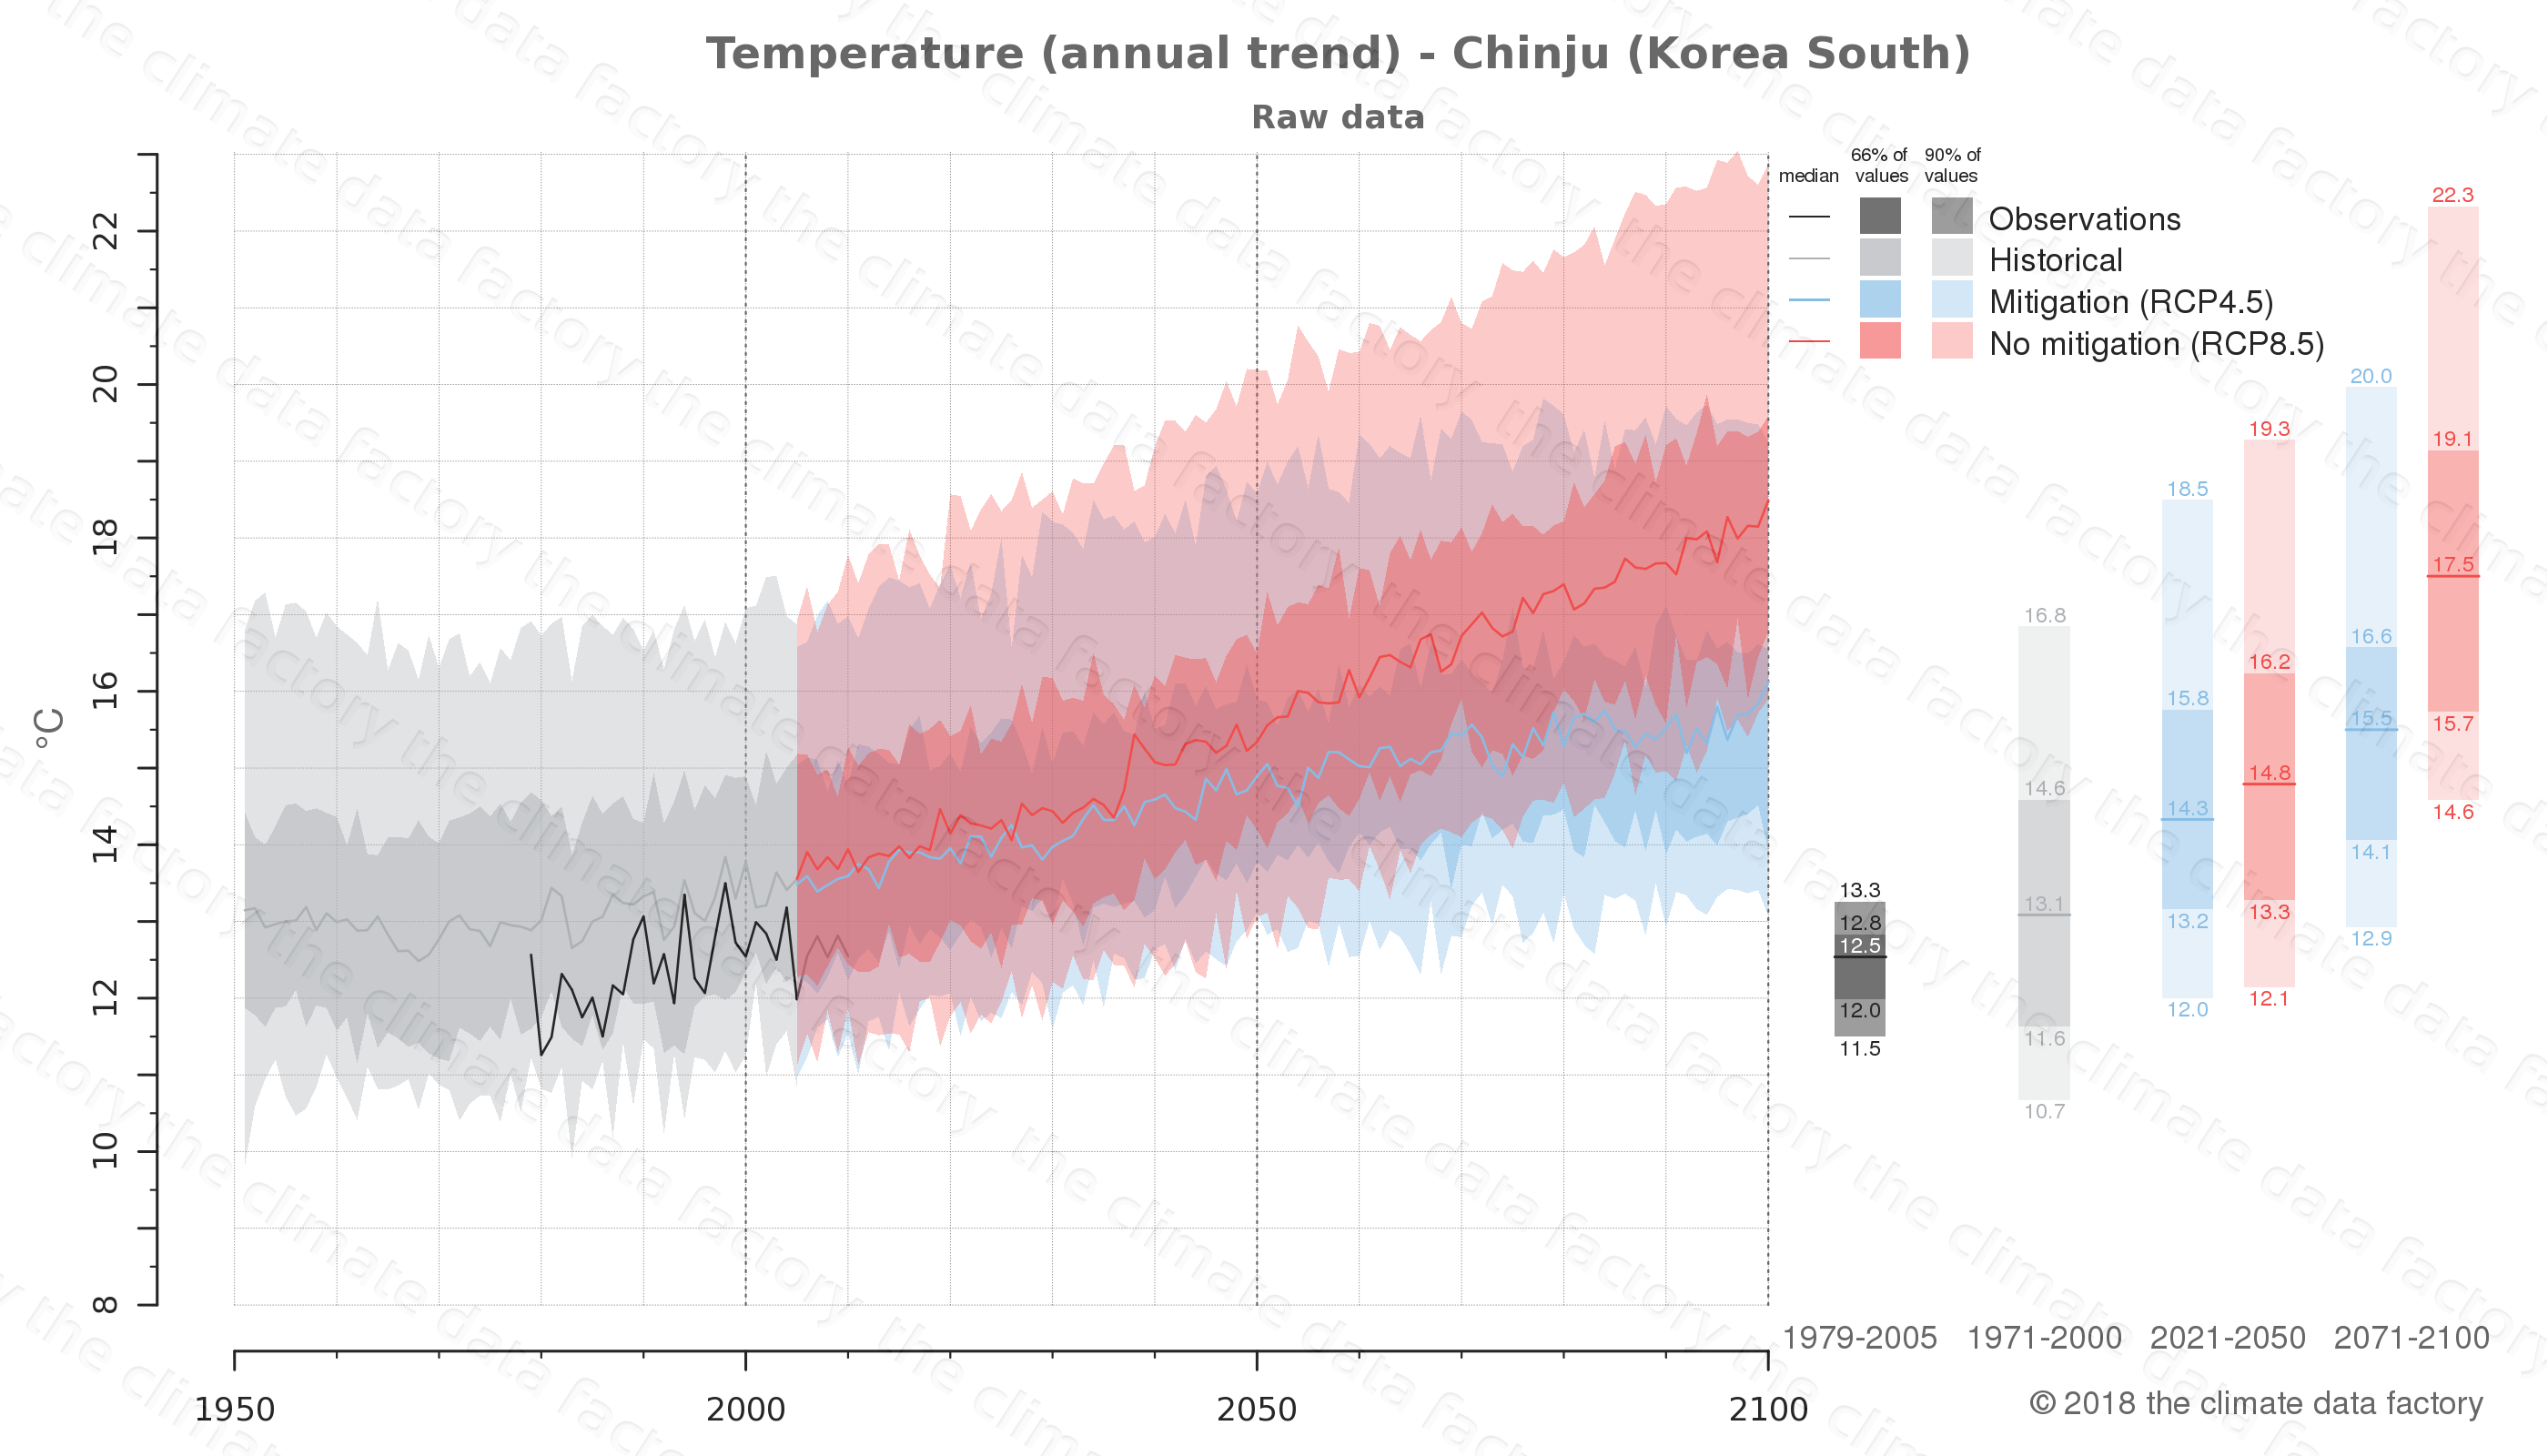 climate change data policy adaptation climate graph city data temperature chinju south korea